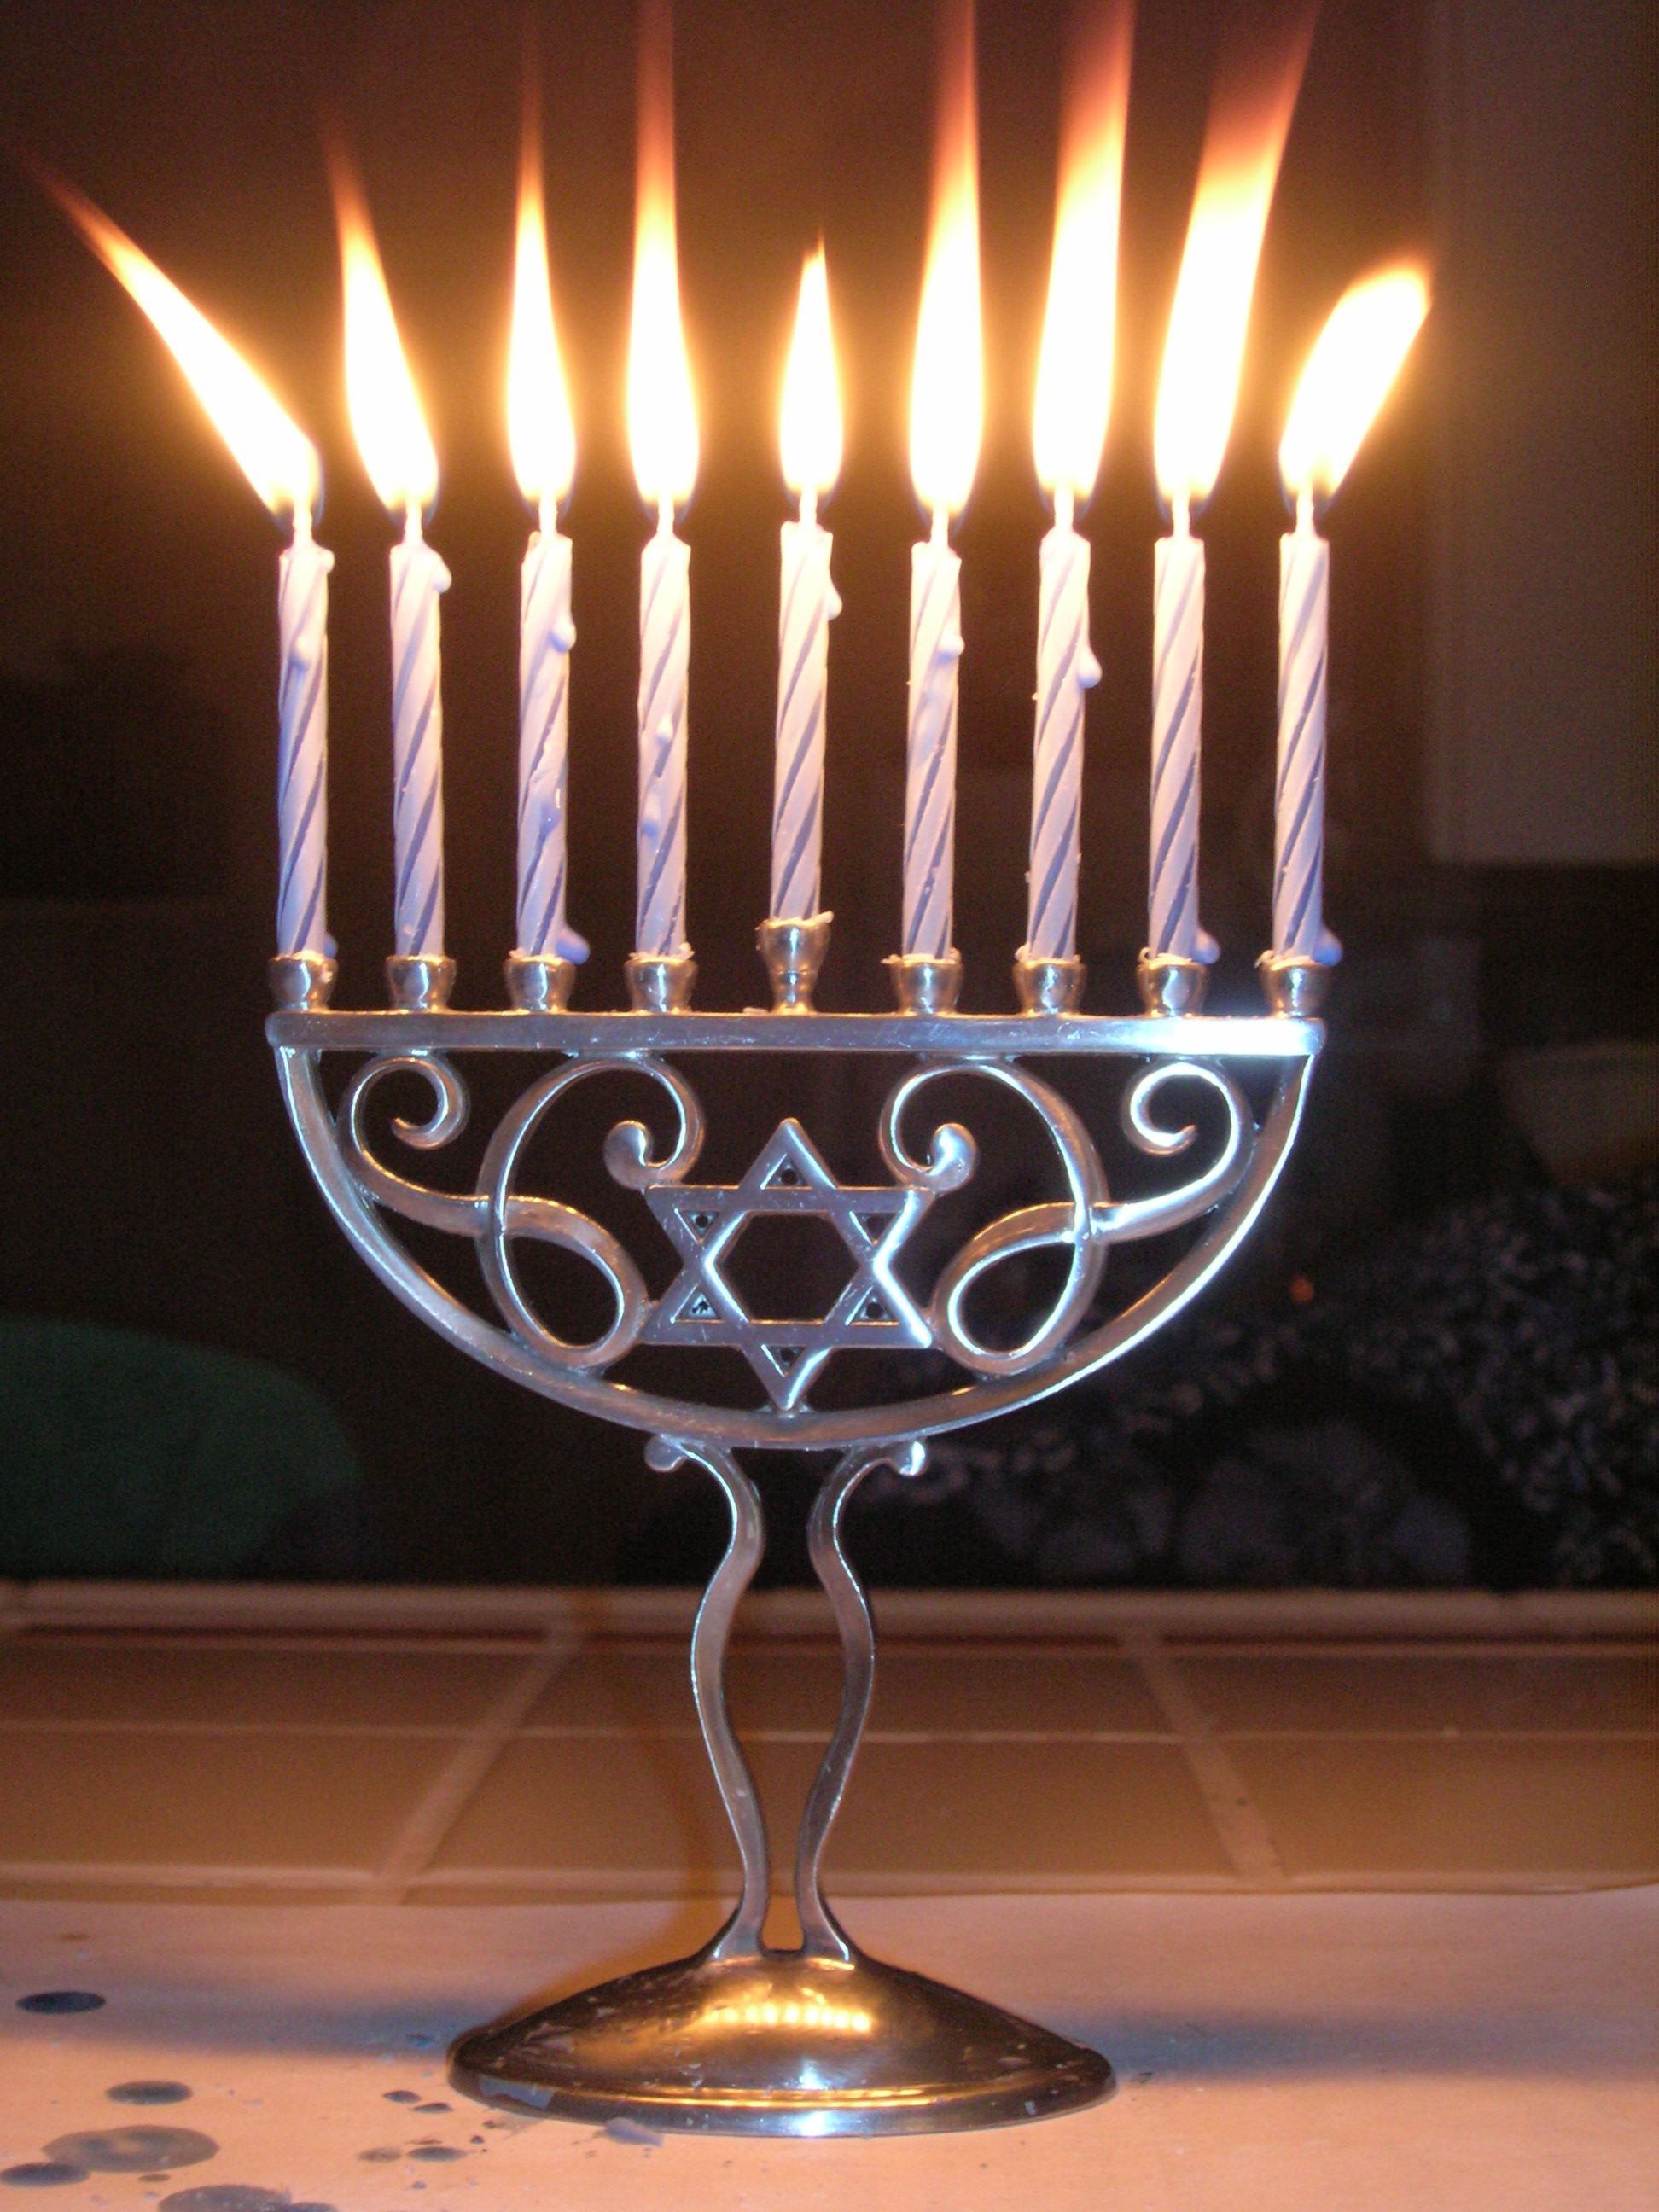 Jewish Holidays Good Humored